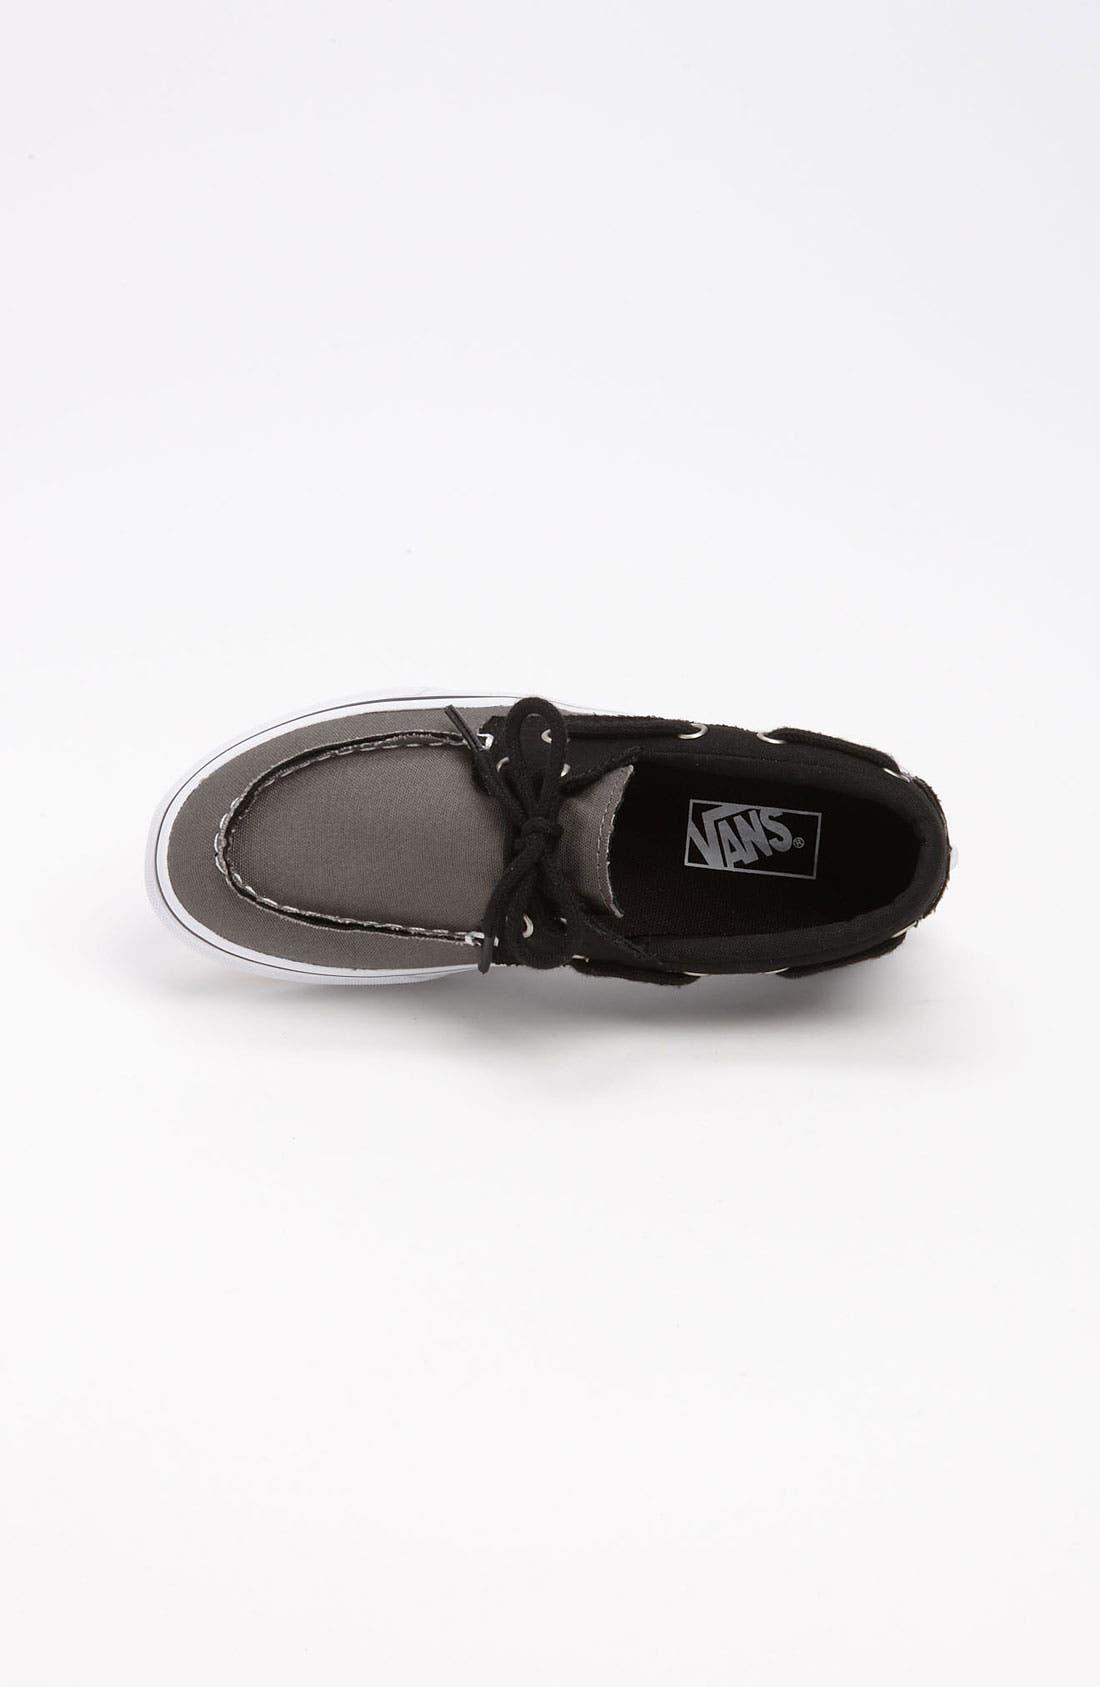 Alternate Image 3  - Vans 'Zapato del Barco' Boat Shoe (Baby, Walker, Toddler, Little Kid & Big Kid)